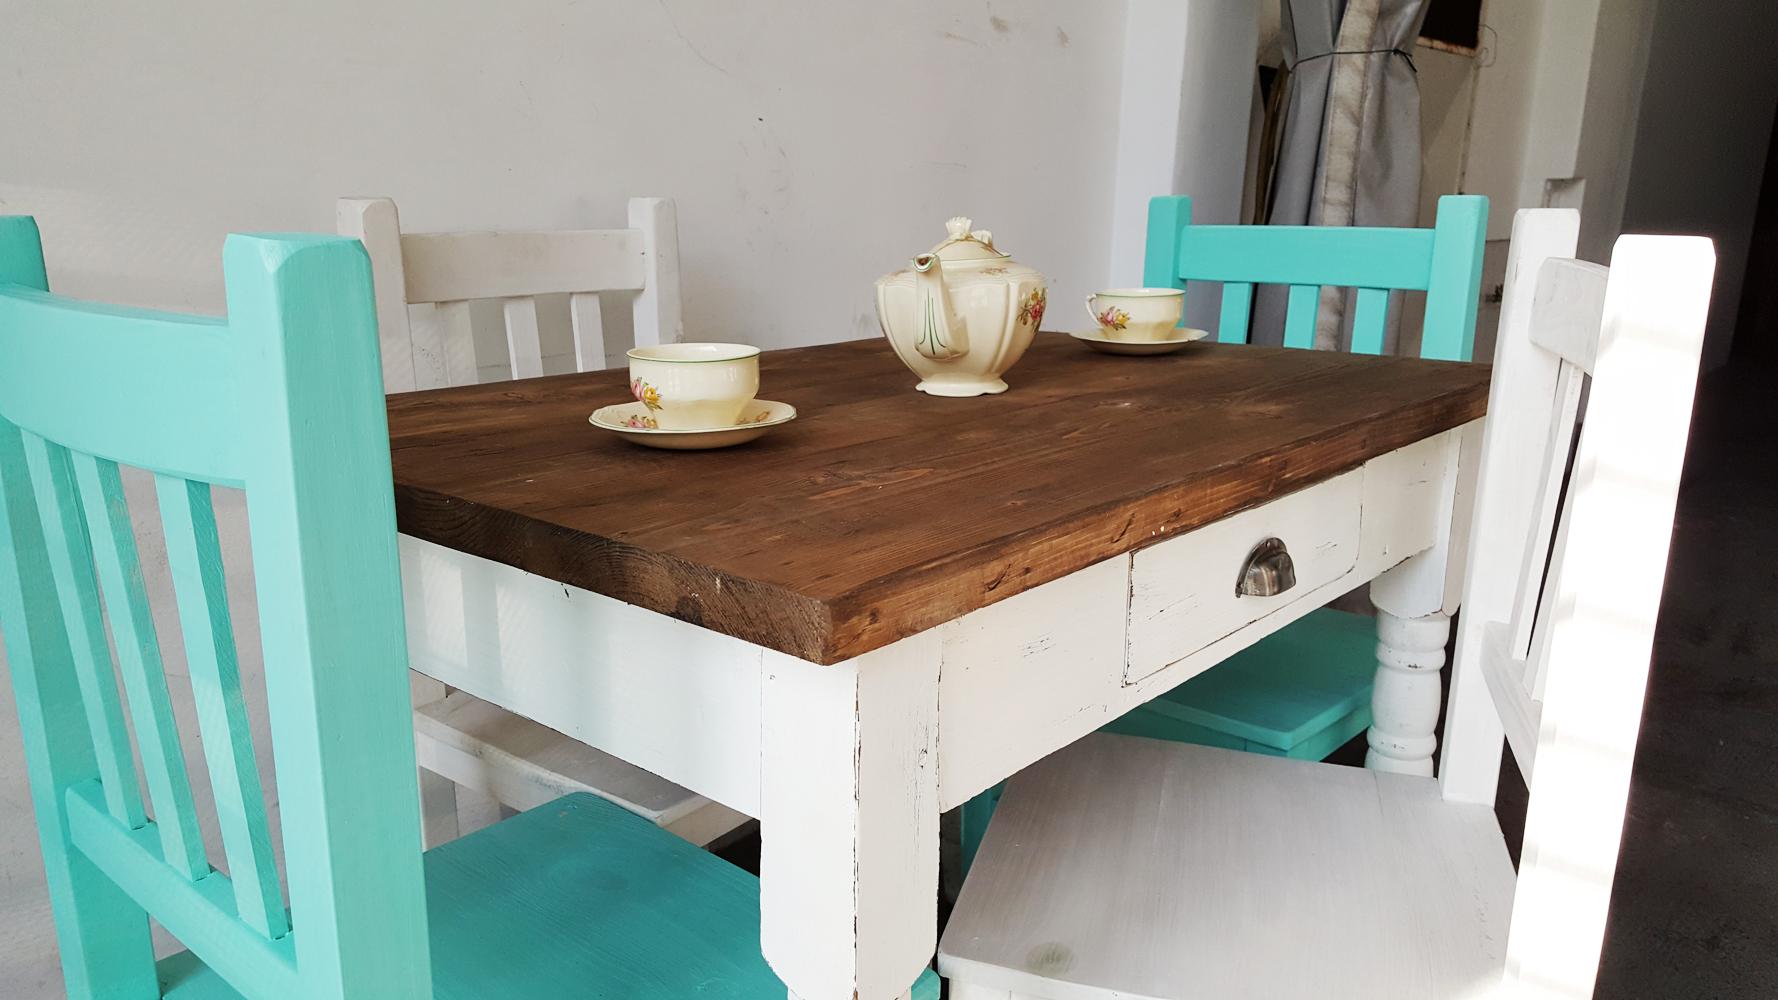 Mesa de campo patas torneadas antigua madera - Patas torneadas de madera ...